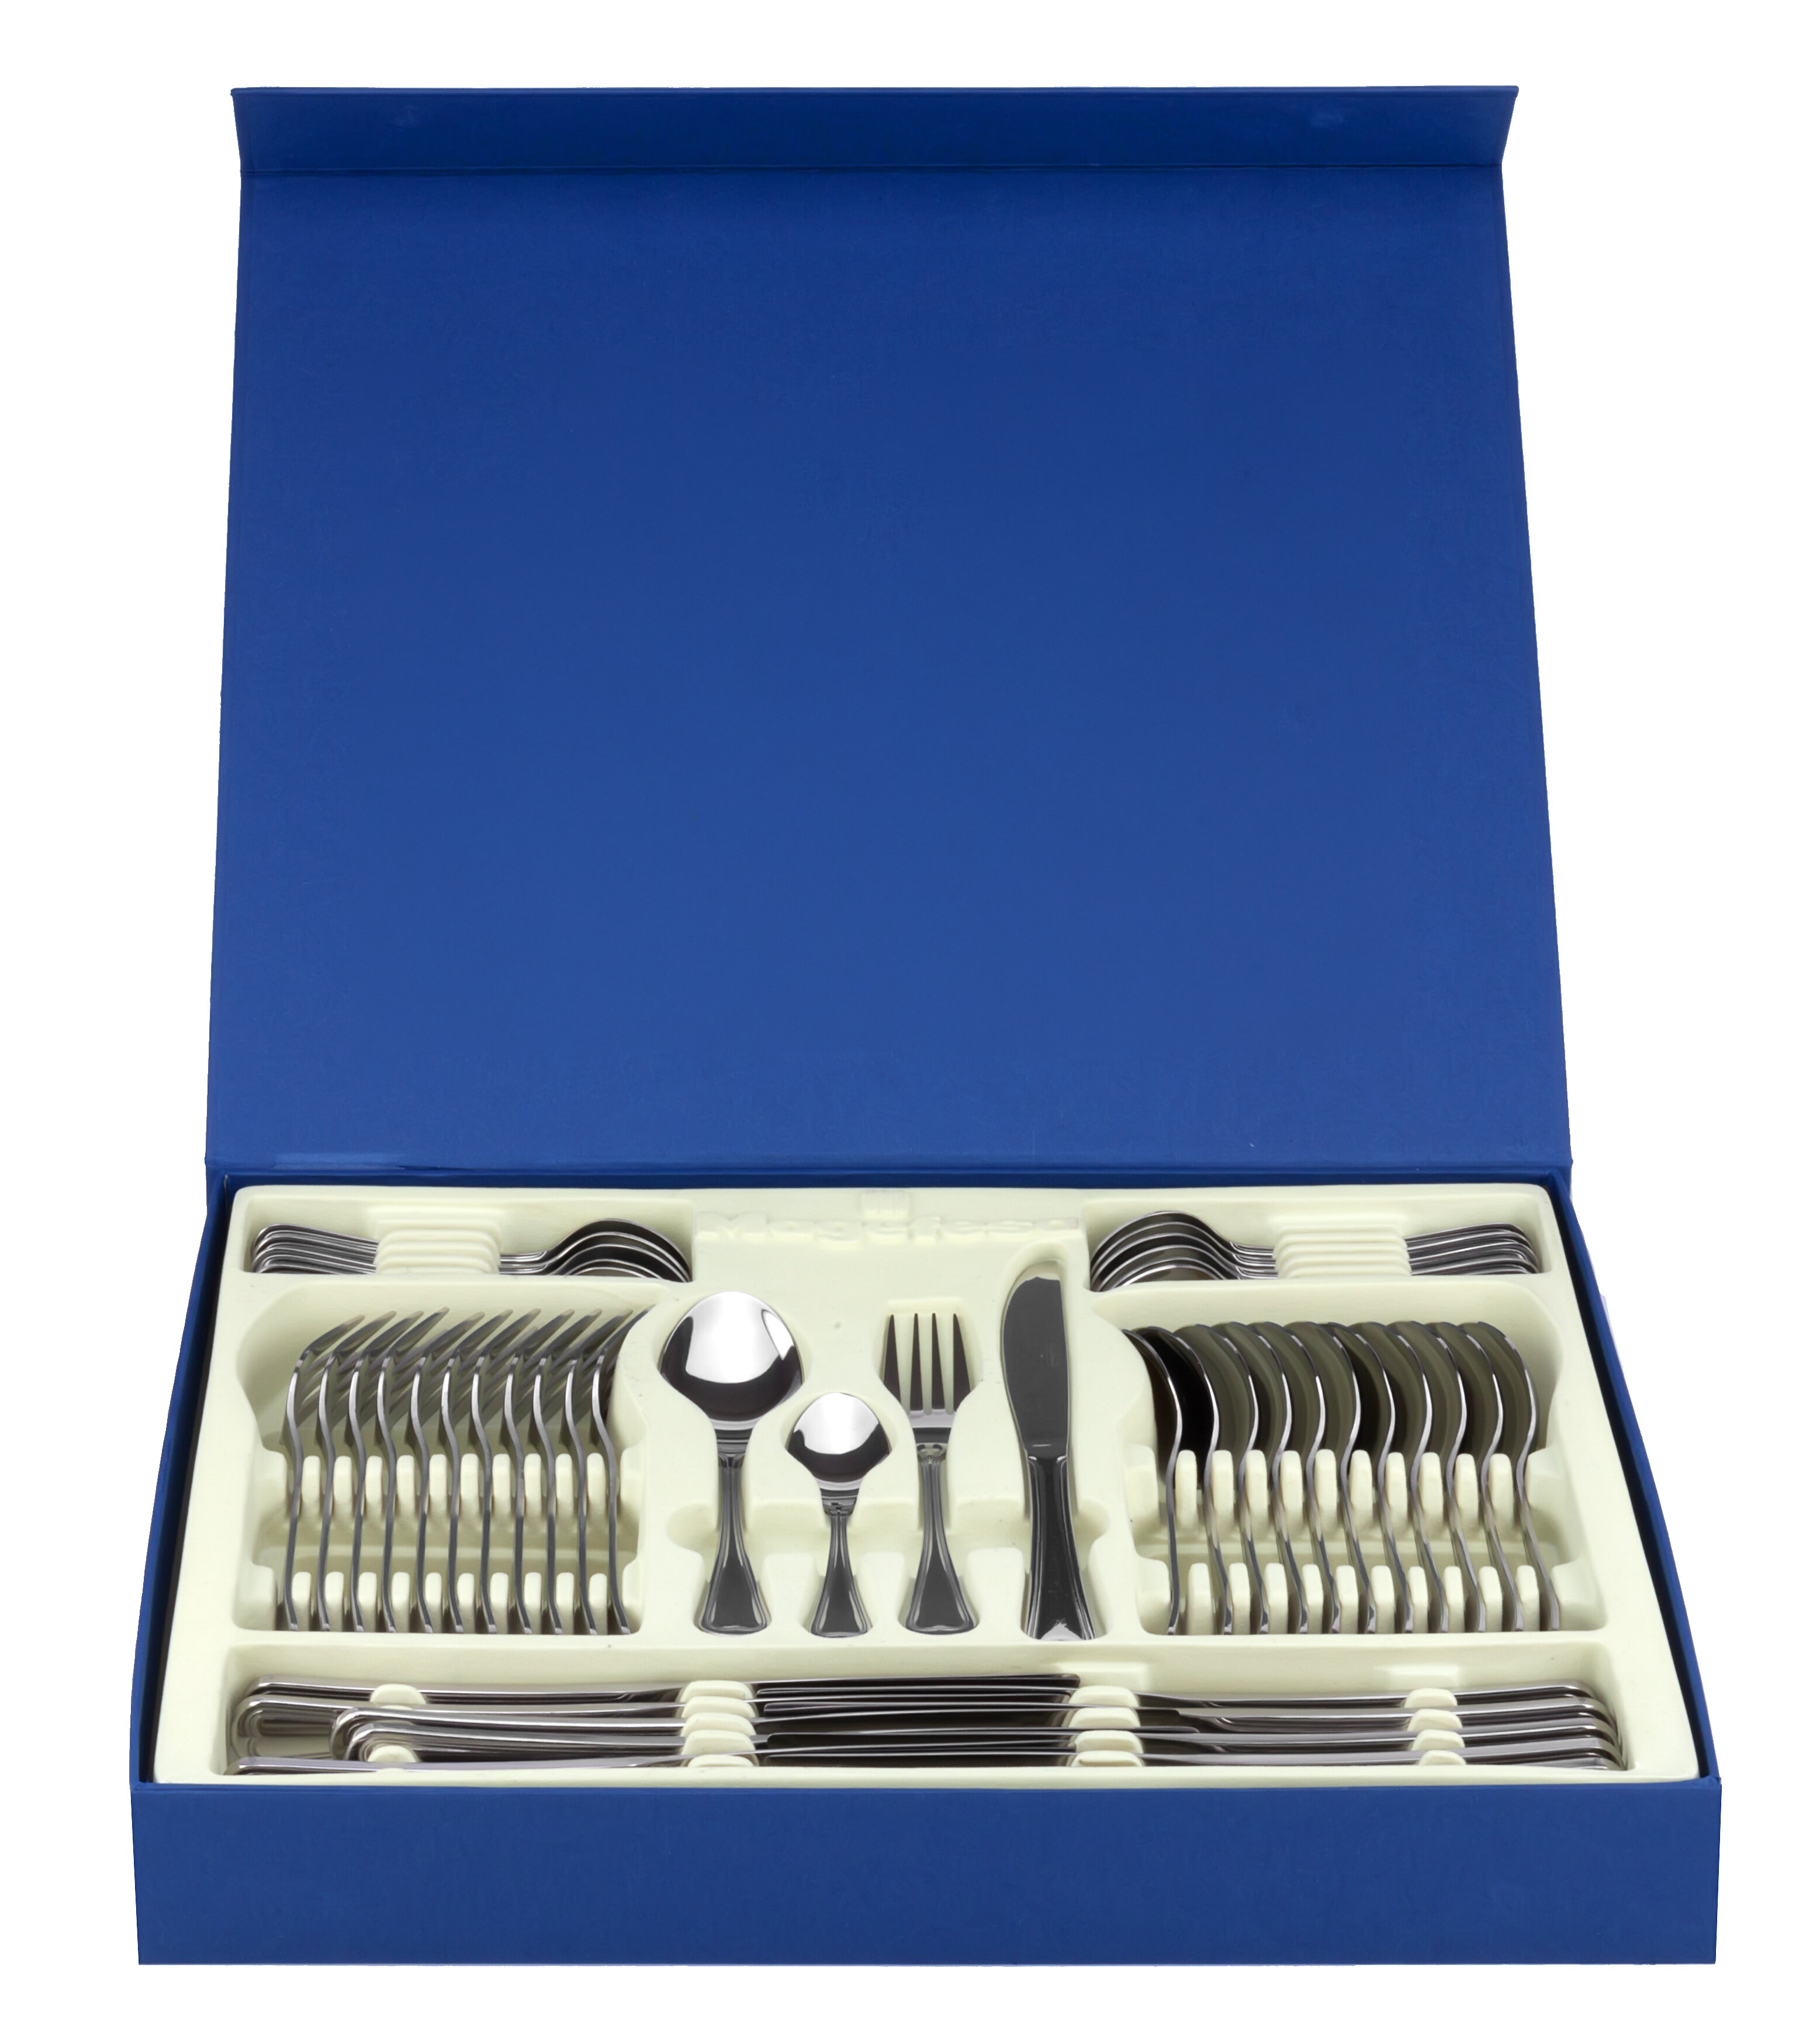 Magefesa Cordoba 48 Piece Stainless Steel Flatware Set | Wayfair